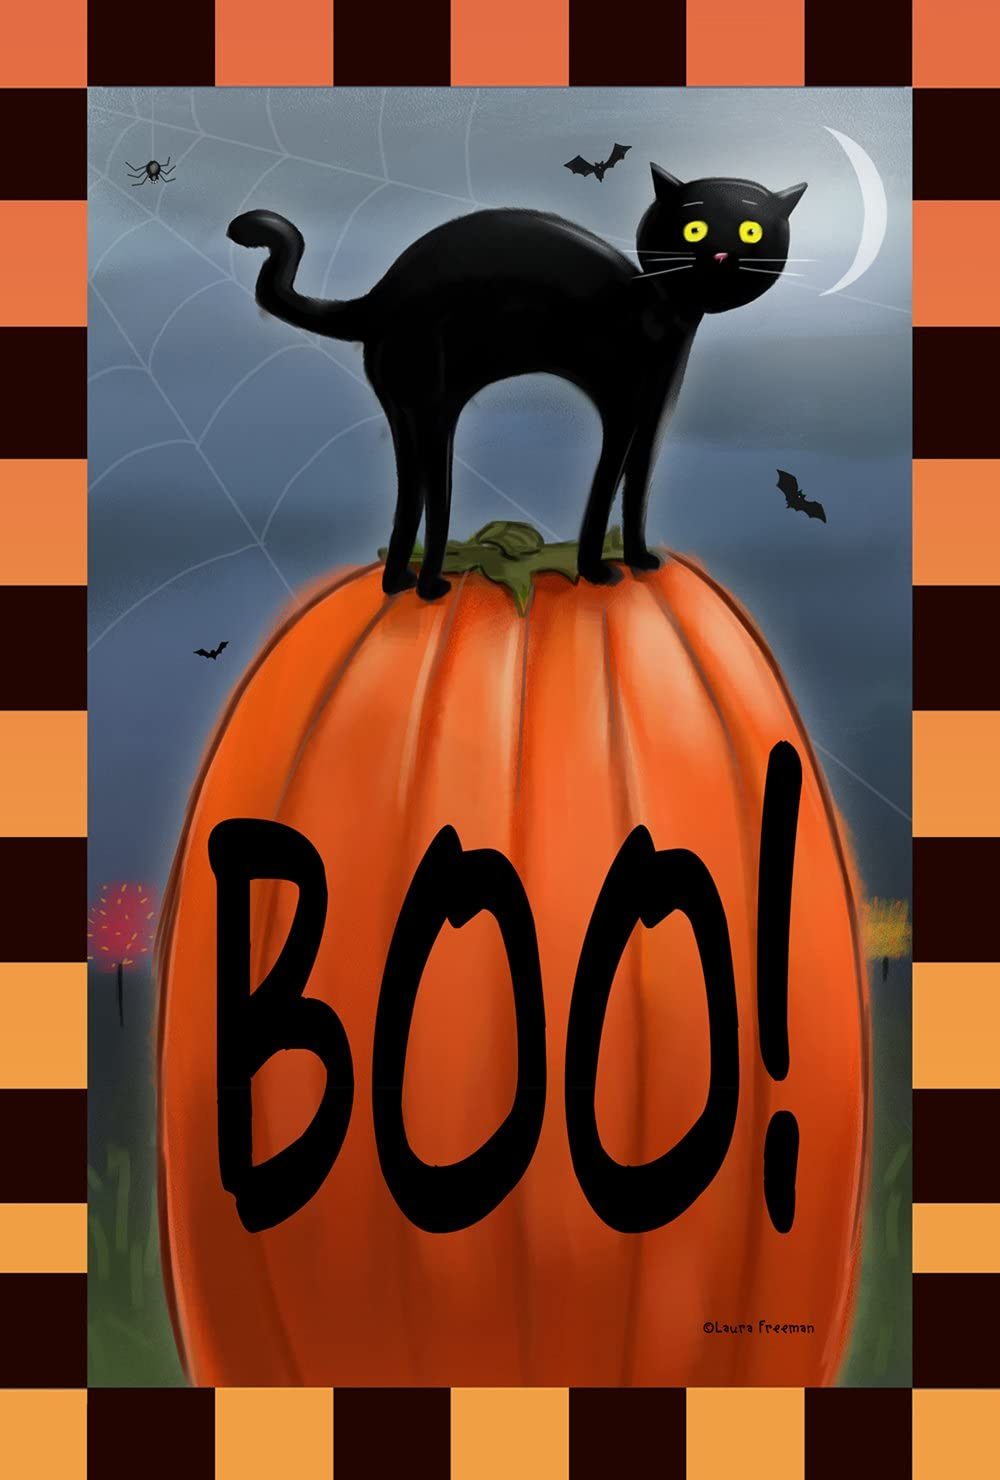 Toland Home Garden Boo Cat 28 X 40 Inch Decorative Black Kitty Halloween Pumpkin House Flag Garden Outdoor